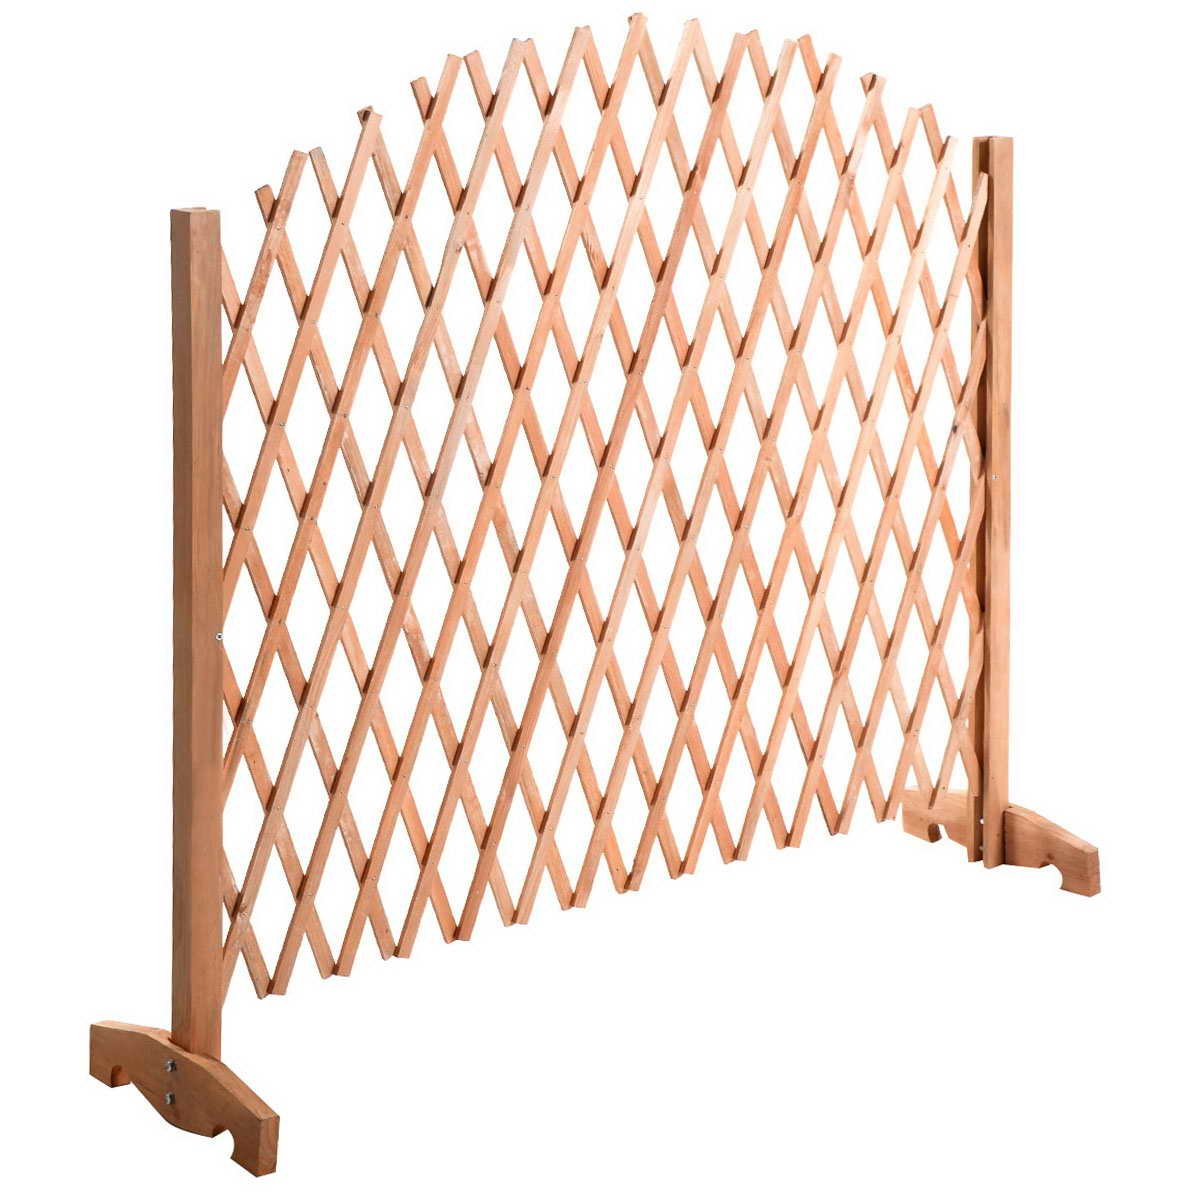 Safstar Free Standing Fence Wooden Expanding Screen Pet Dog Gate Child Kids Barrier by S AFSTAR (Image #3)